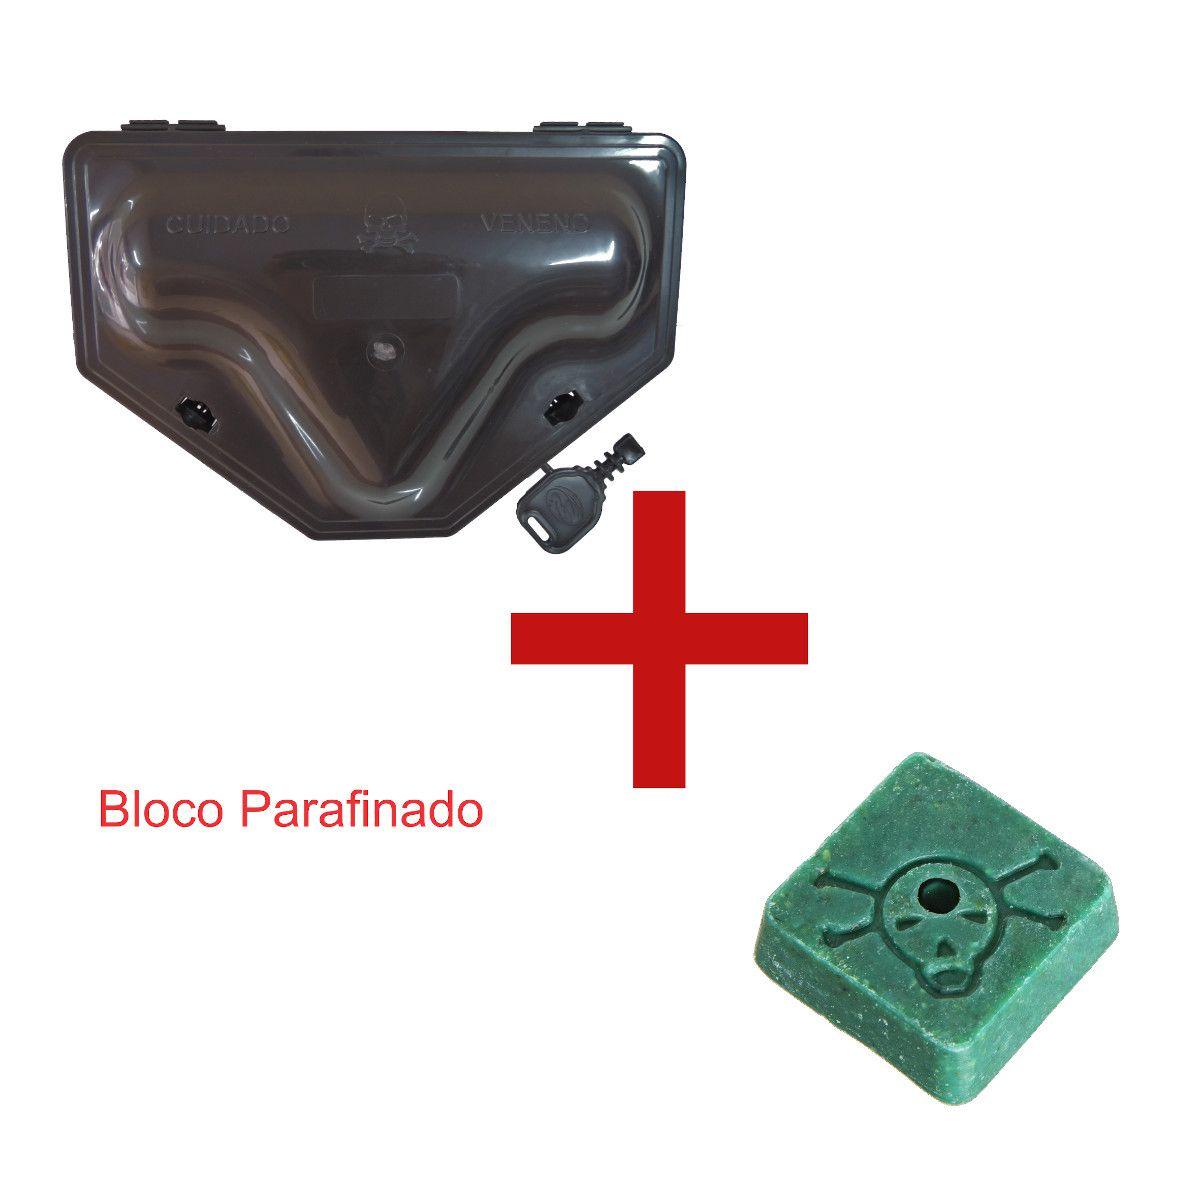 KIT 40 Porta Iscas Reforçado 2 TRAVAS Chave Ratoeira p/Ratos